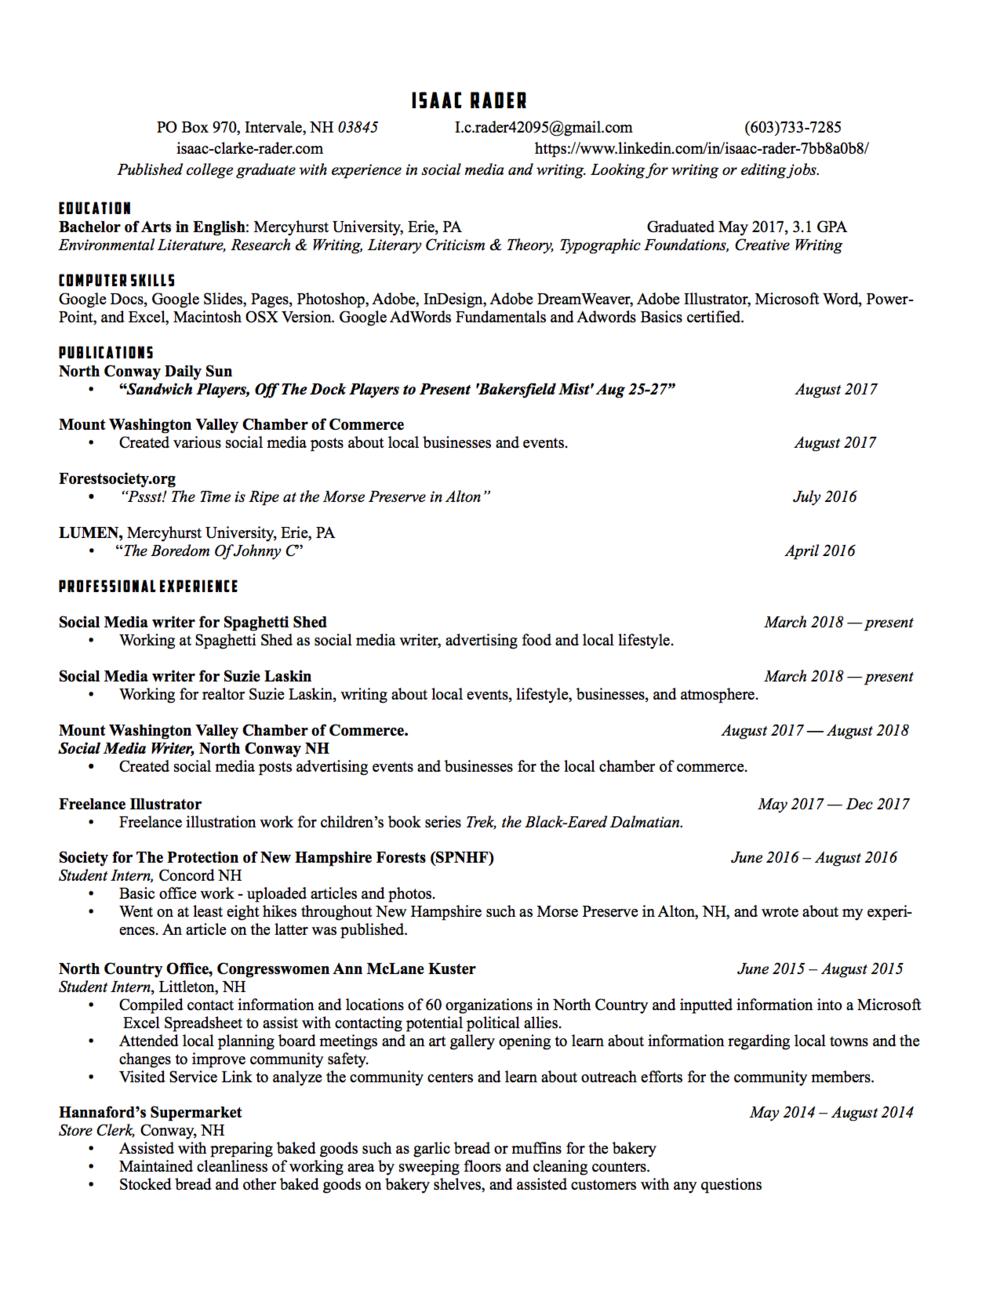 Resume — Isaac Clarke Rader